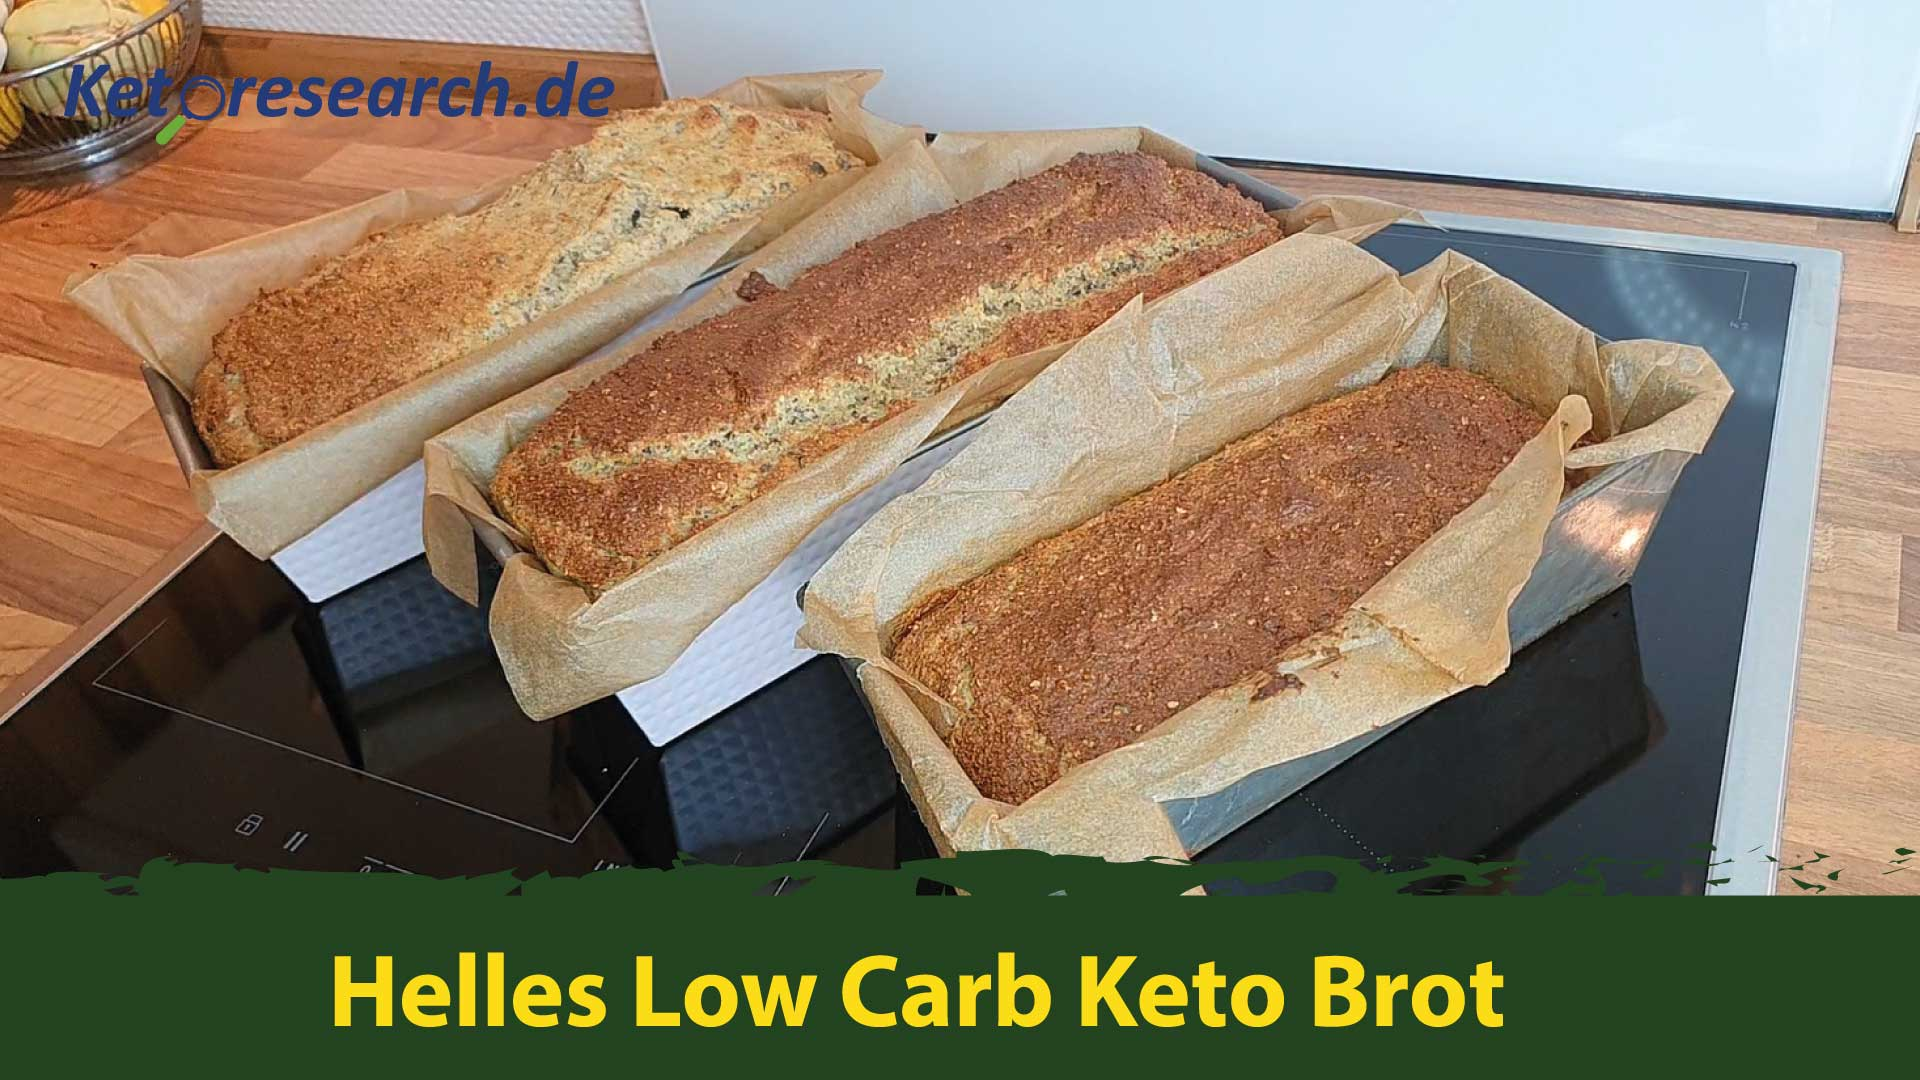 Low Carb Keto Brot